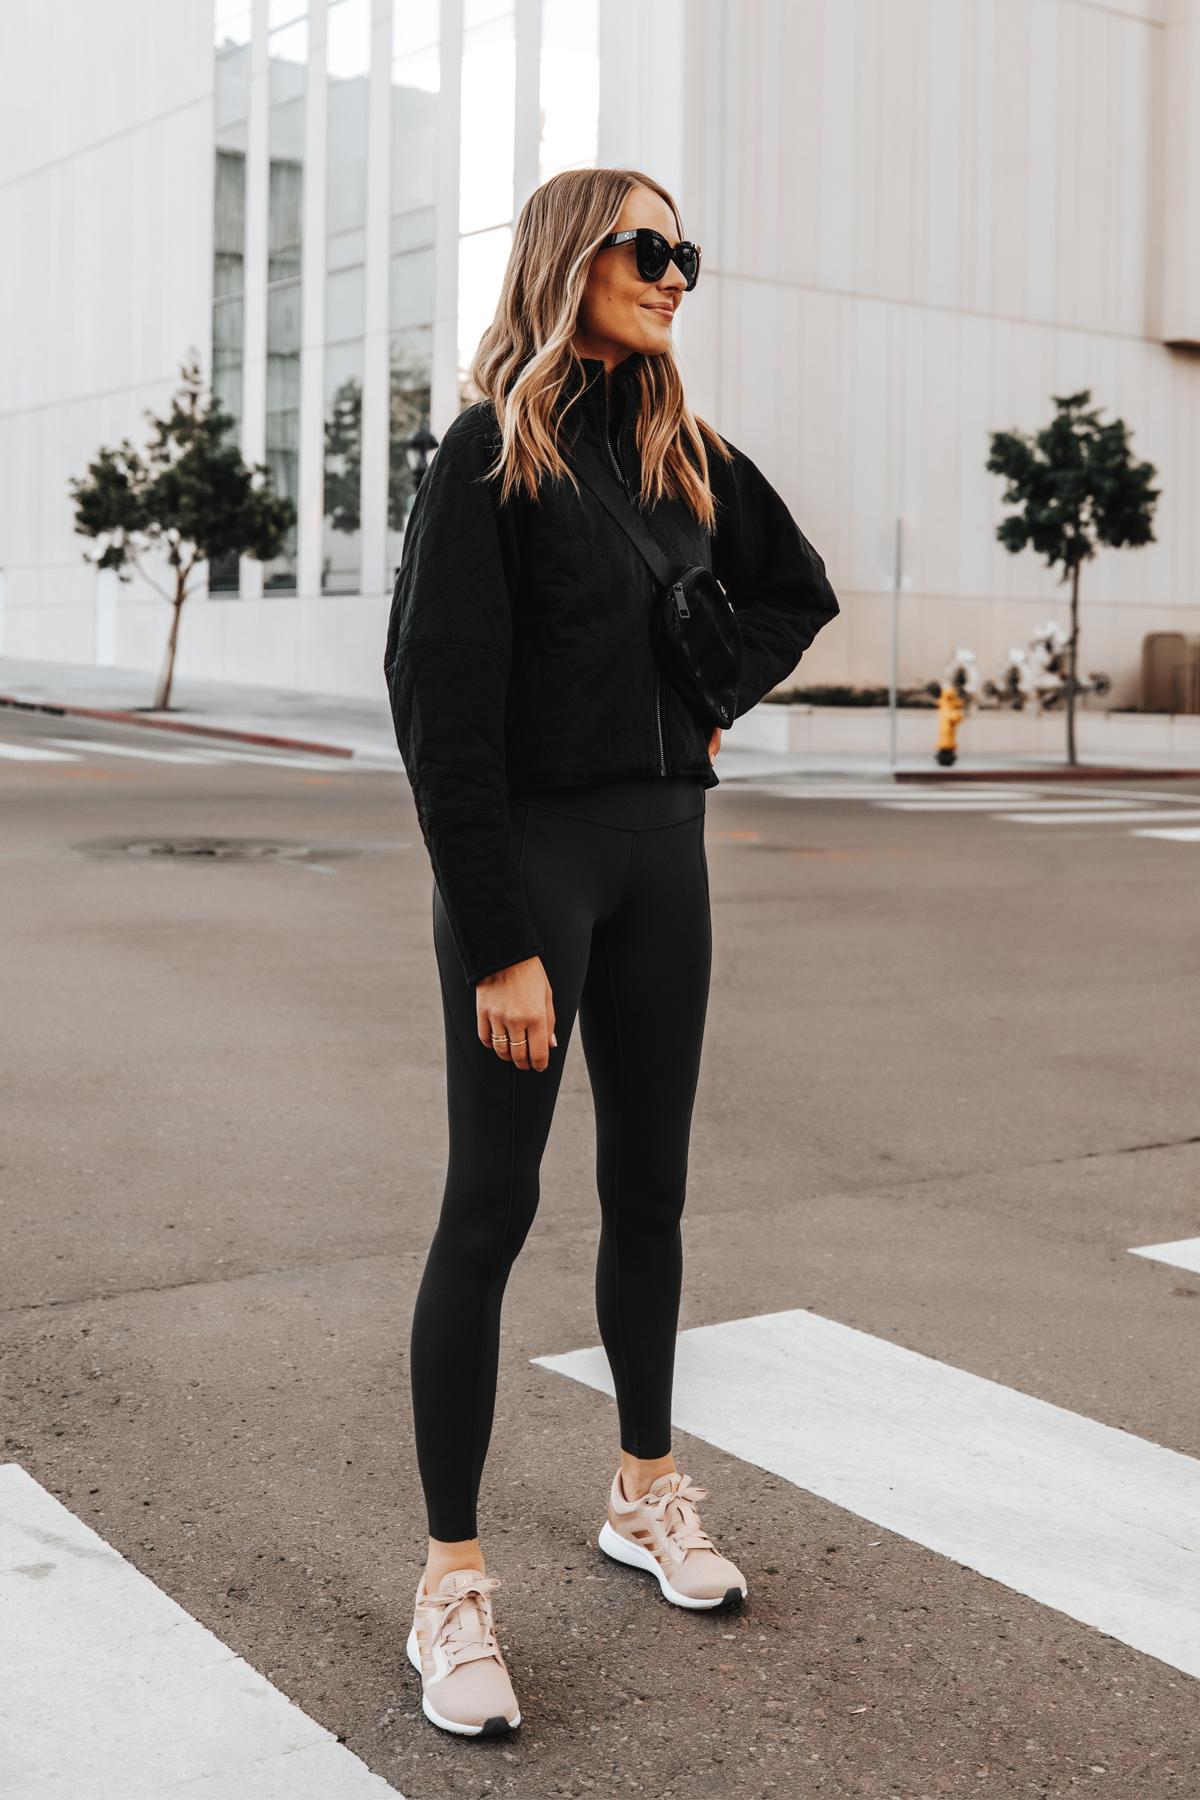 Fashion Jackson Wearing lululemon Black Outfit adidas Pink Sneakers